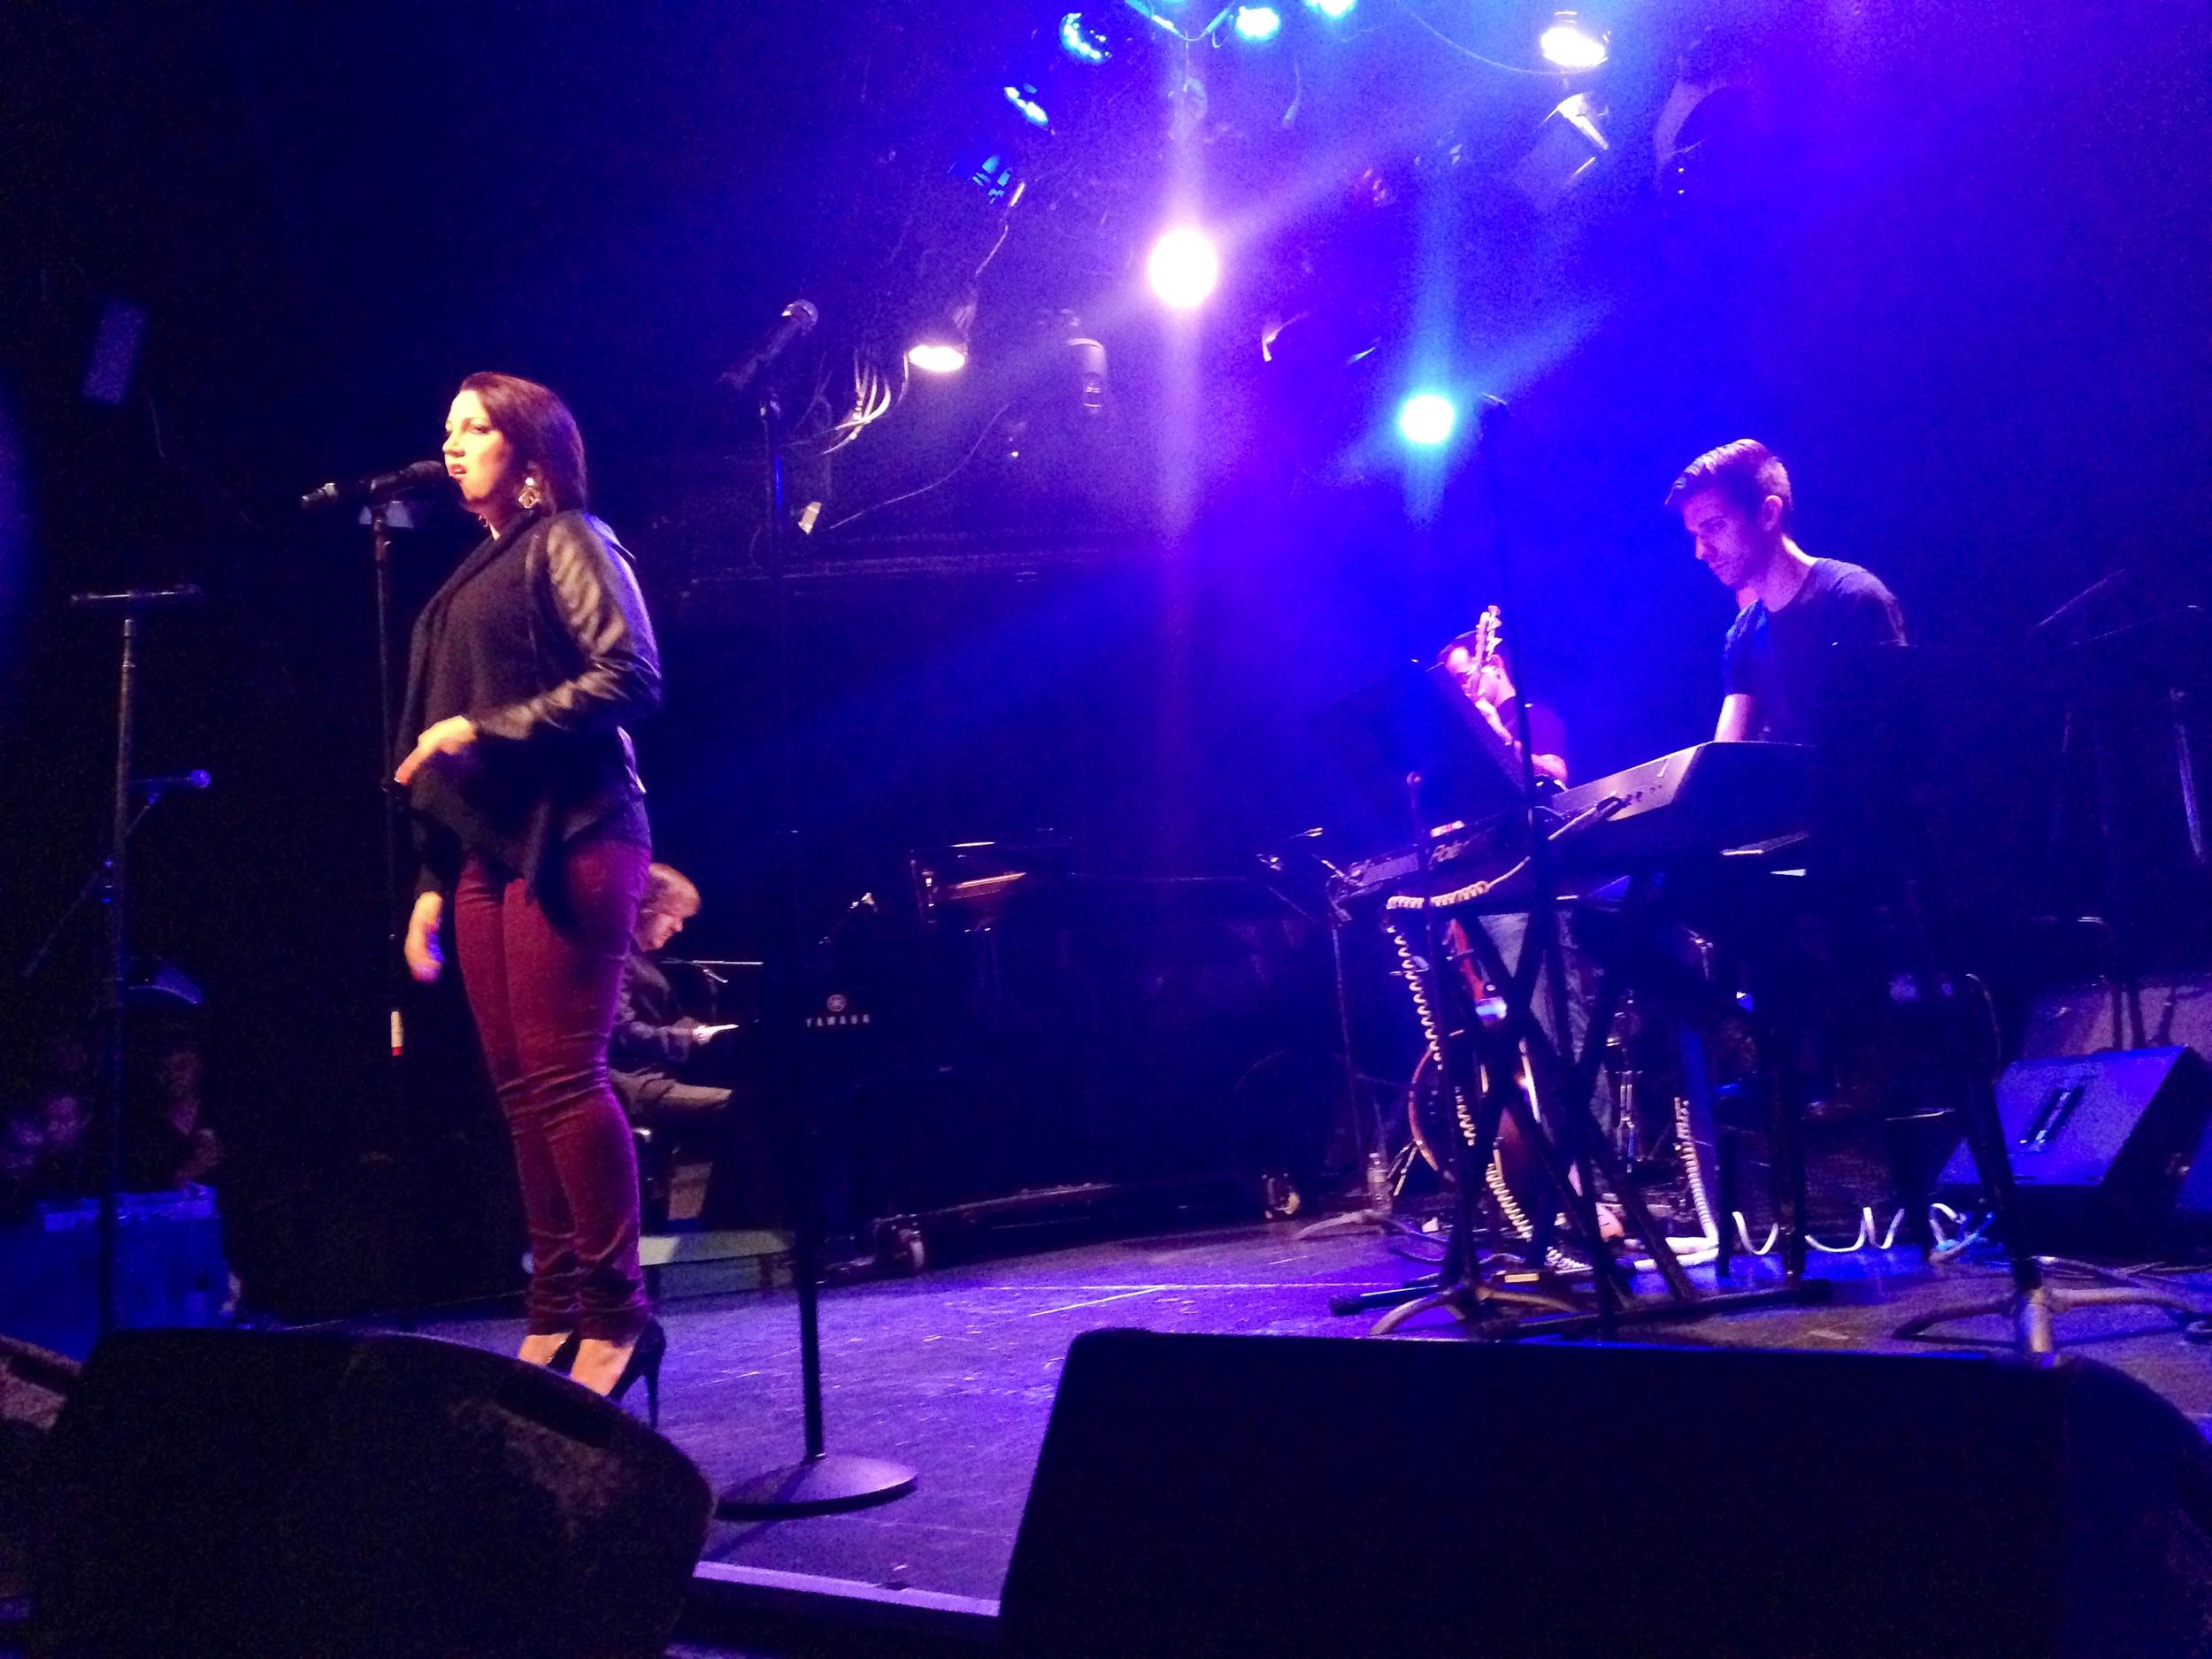 Natali Weis: Broadway Sings Justin Timberlake at Le Poisson Rouge, NYC